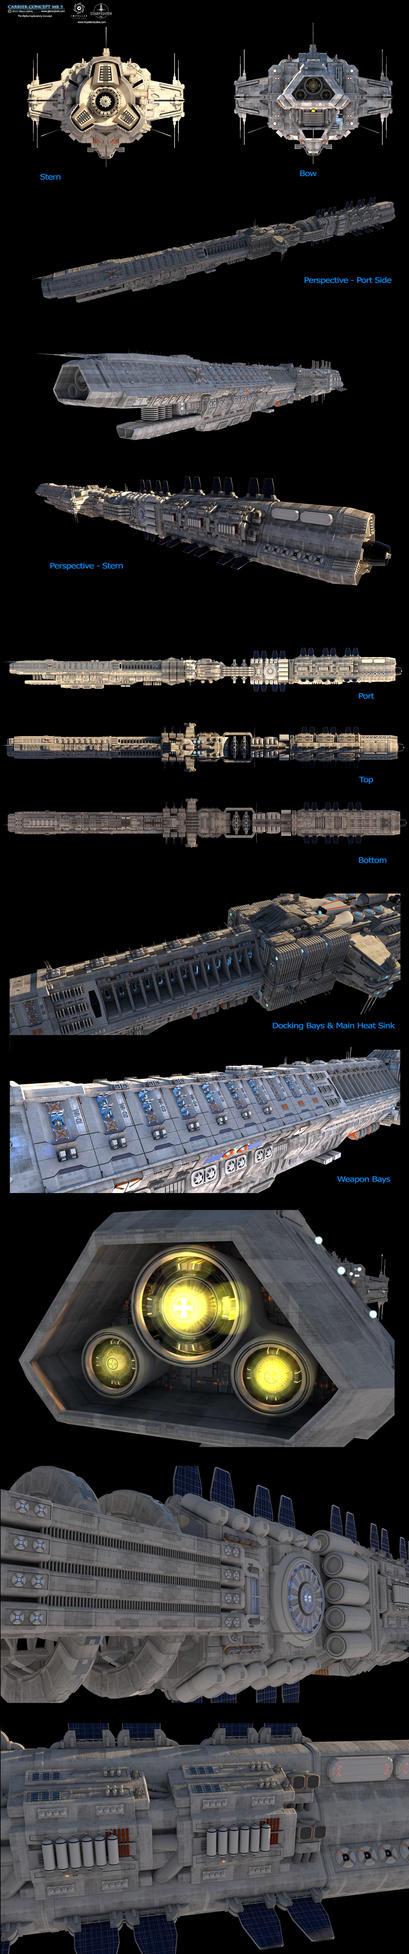 Carrier Concept-MK5 by GlennClovis